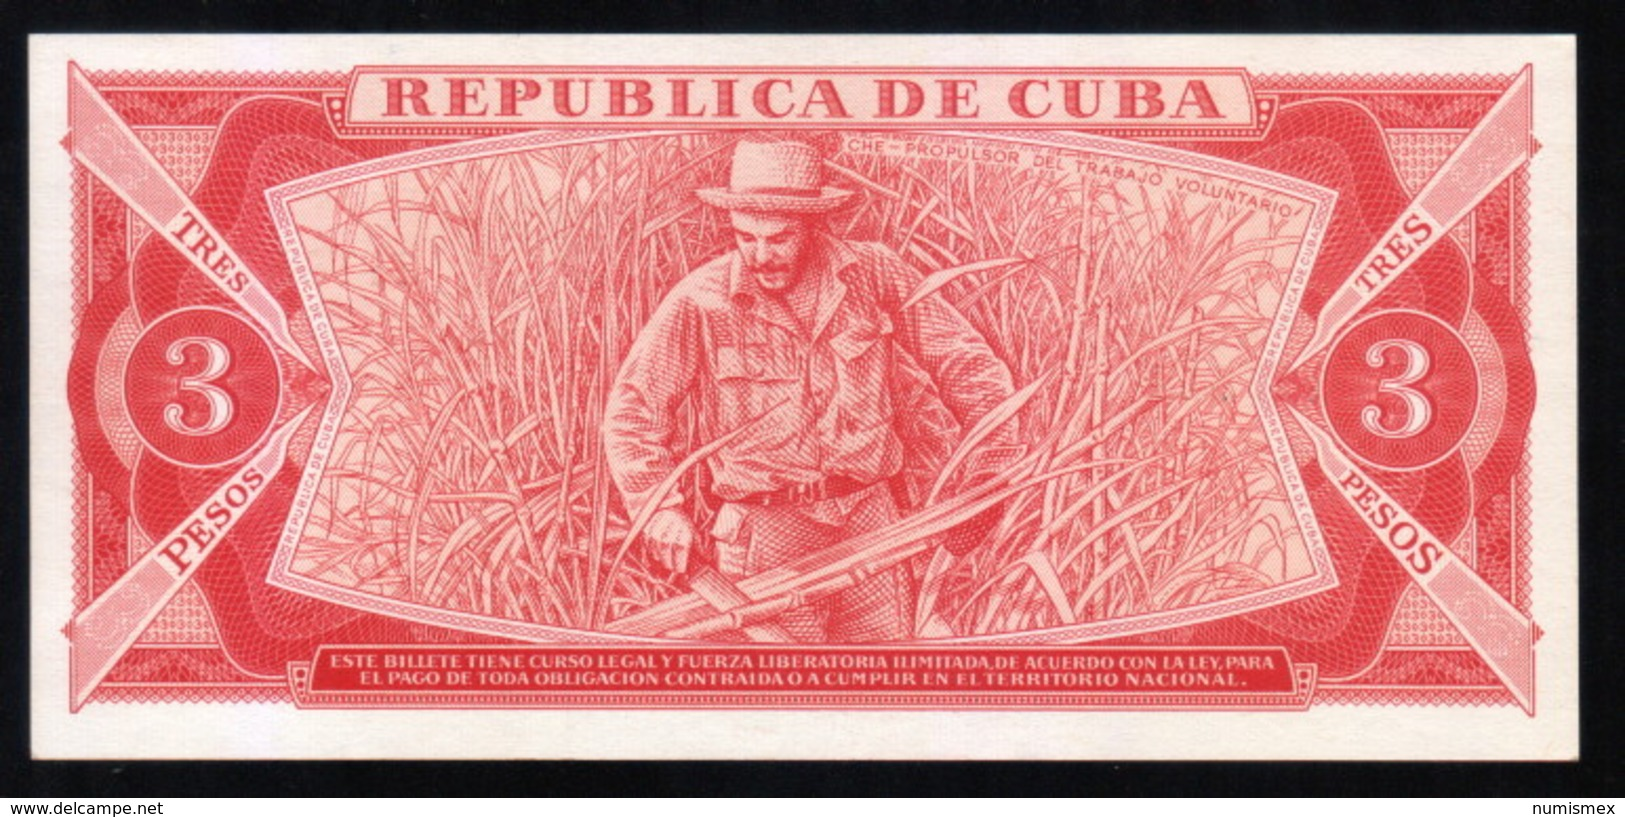 Caribe  / 3 PESOS 1984 Serie CE-01 150680 FIRST SERIE Pick 107a UNC RARE - Cuba